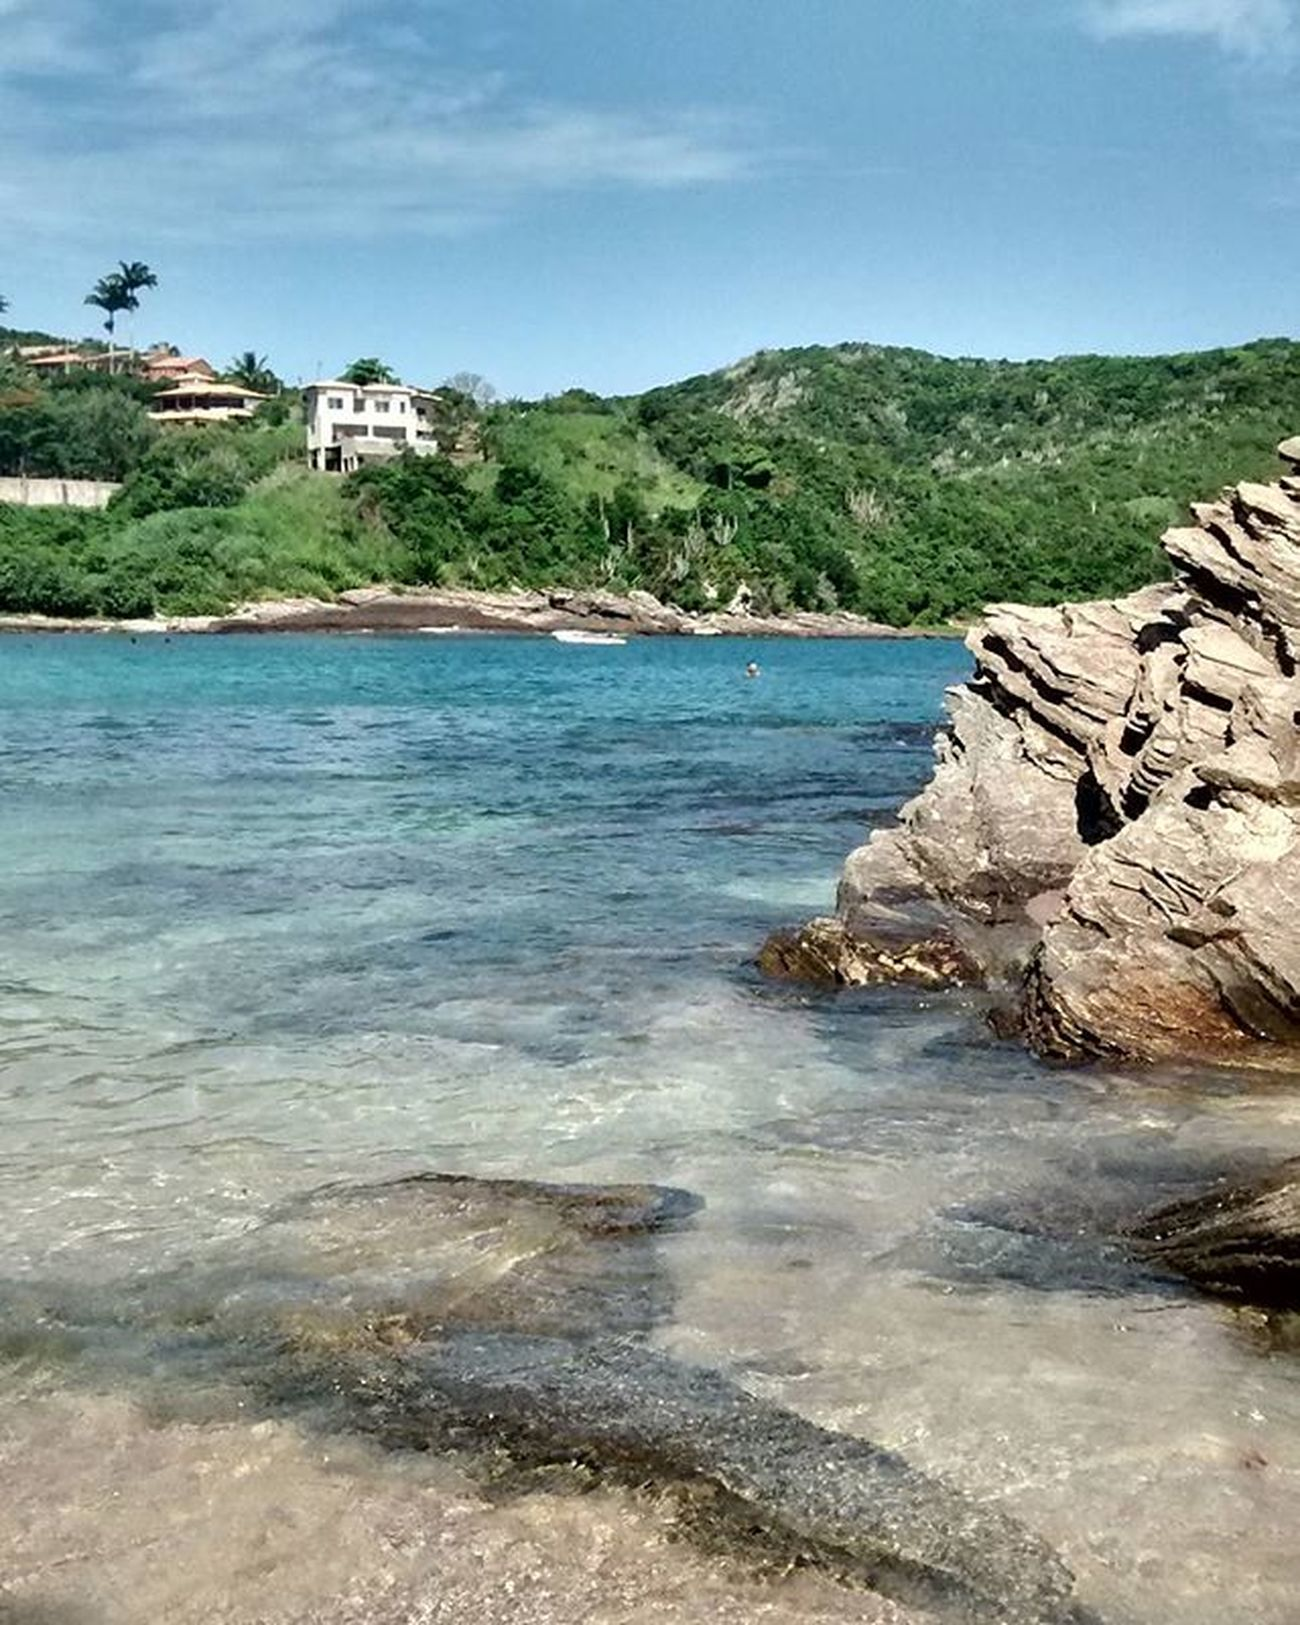 Playa Beach Praia Ferradurinha Buzios Buziosrj Riodejaneiro Rj40graus Brasil Brazil Semfiltro